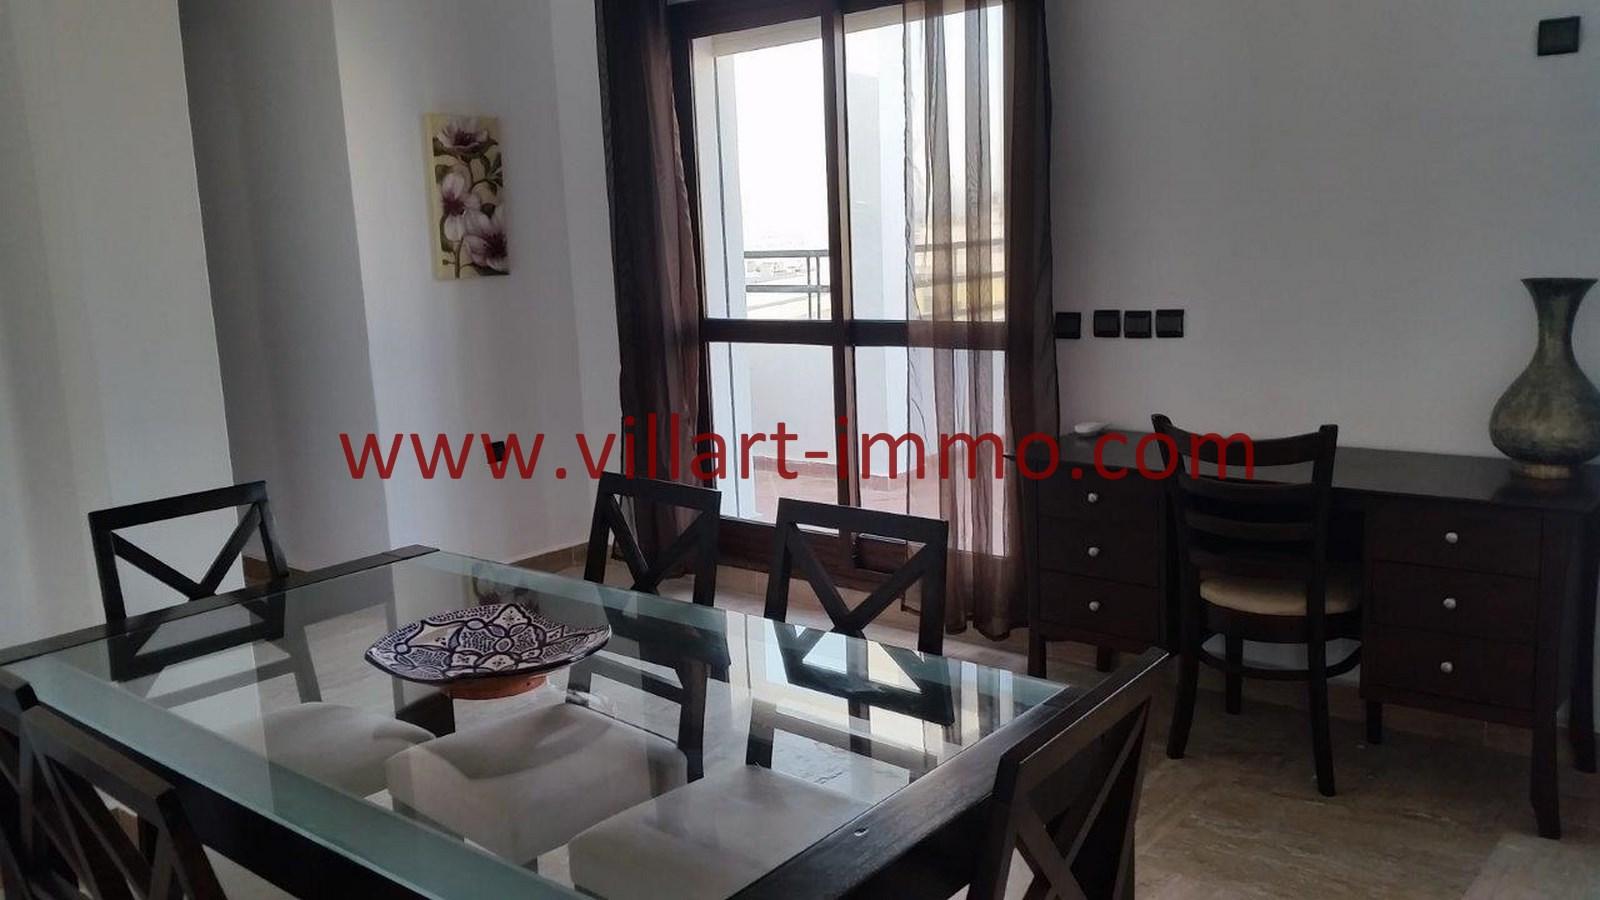 2-location-appartement-meuble-centre-ville-tanger-salle-a-manger-l909-villart-immo